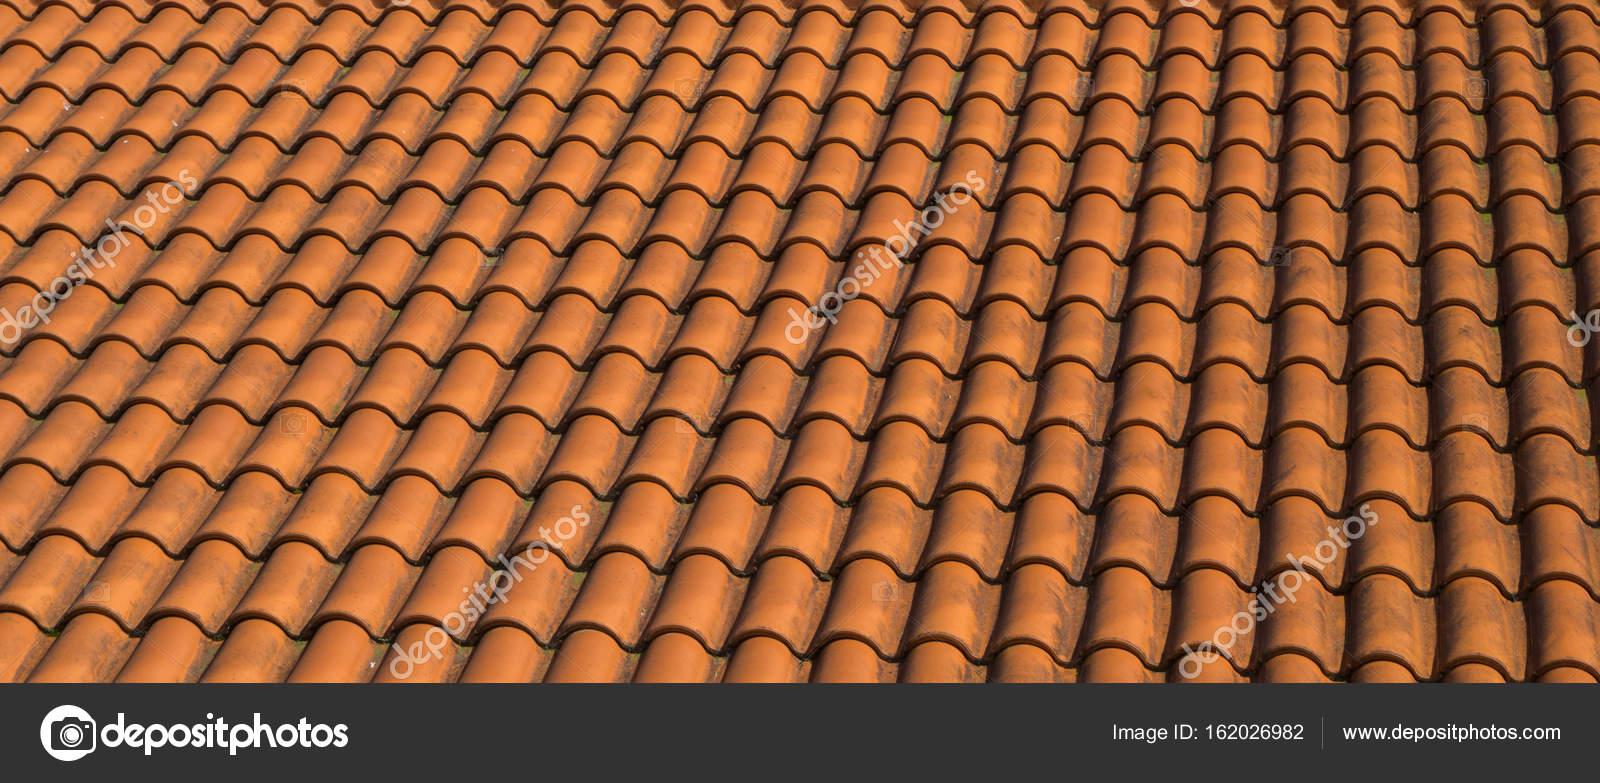 https depositphotos com 162026982 stock photo texture of classic shingles repeated html